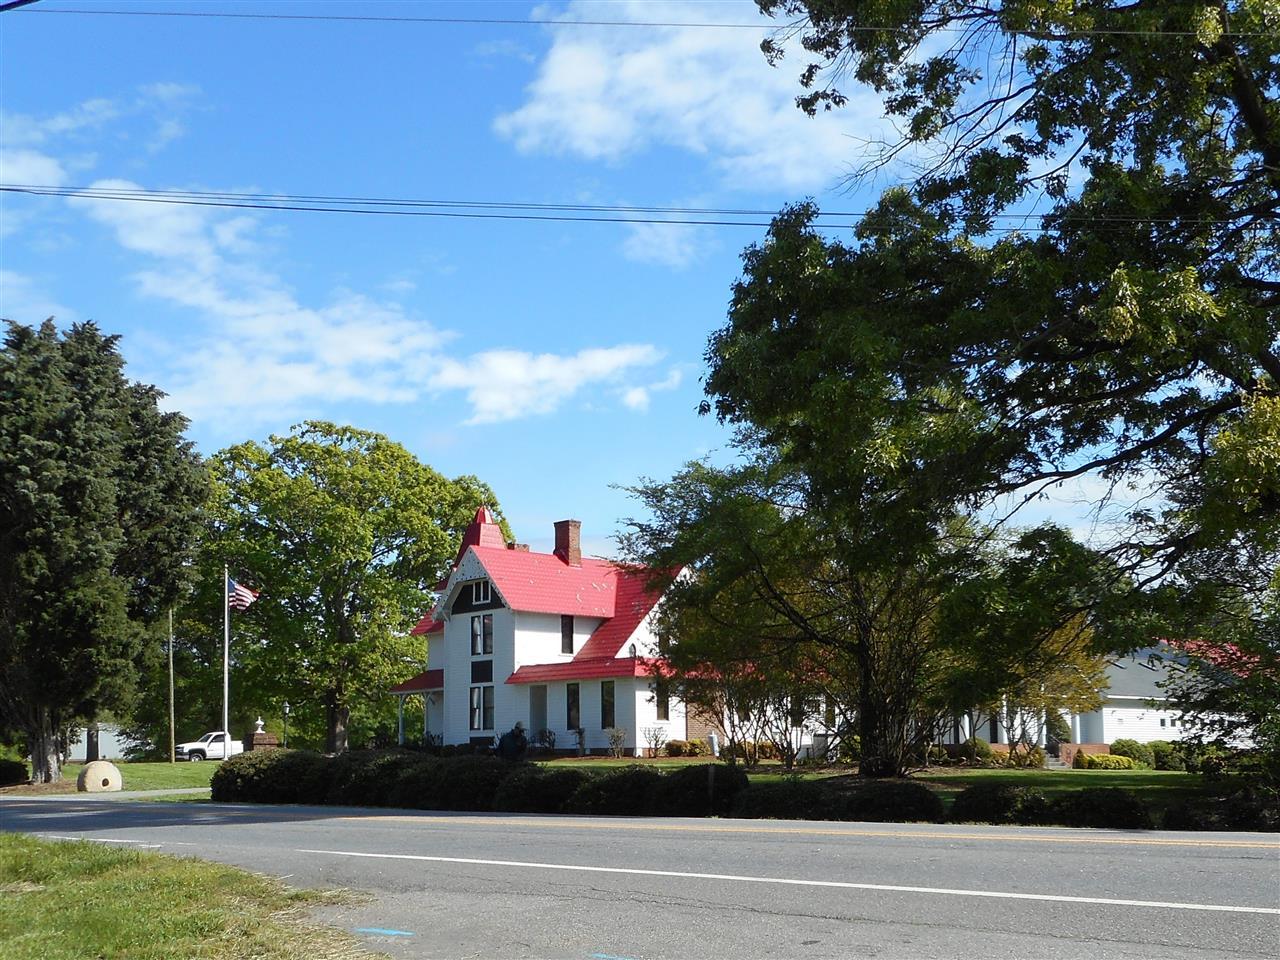 Old Farm House in  Terrell, North Carolina